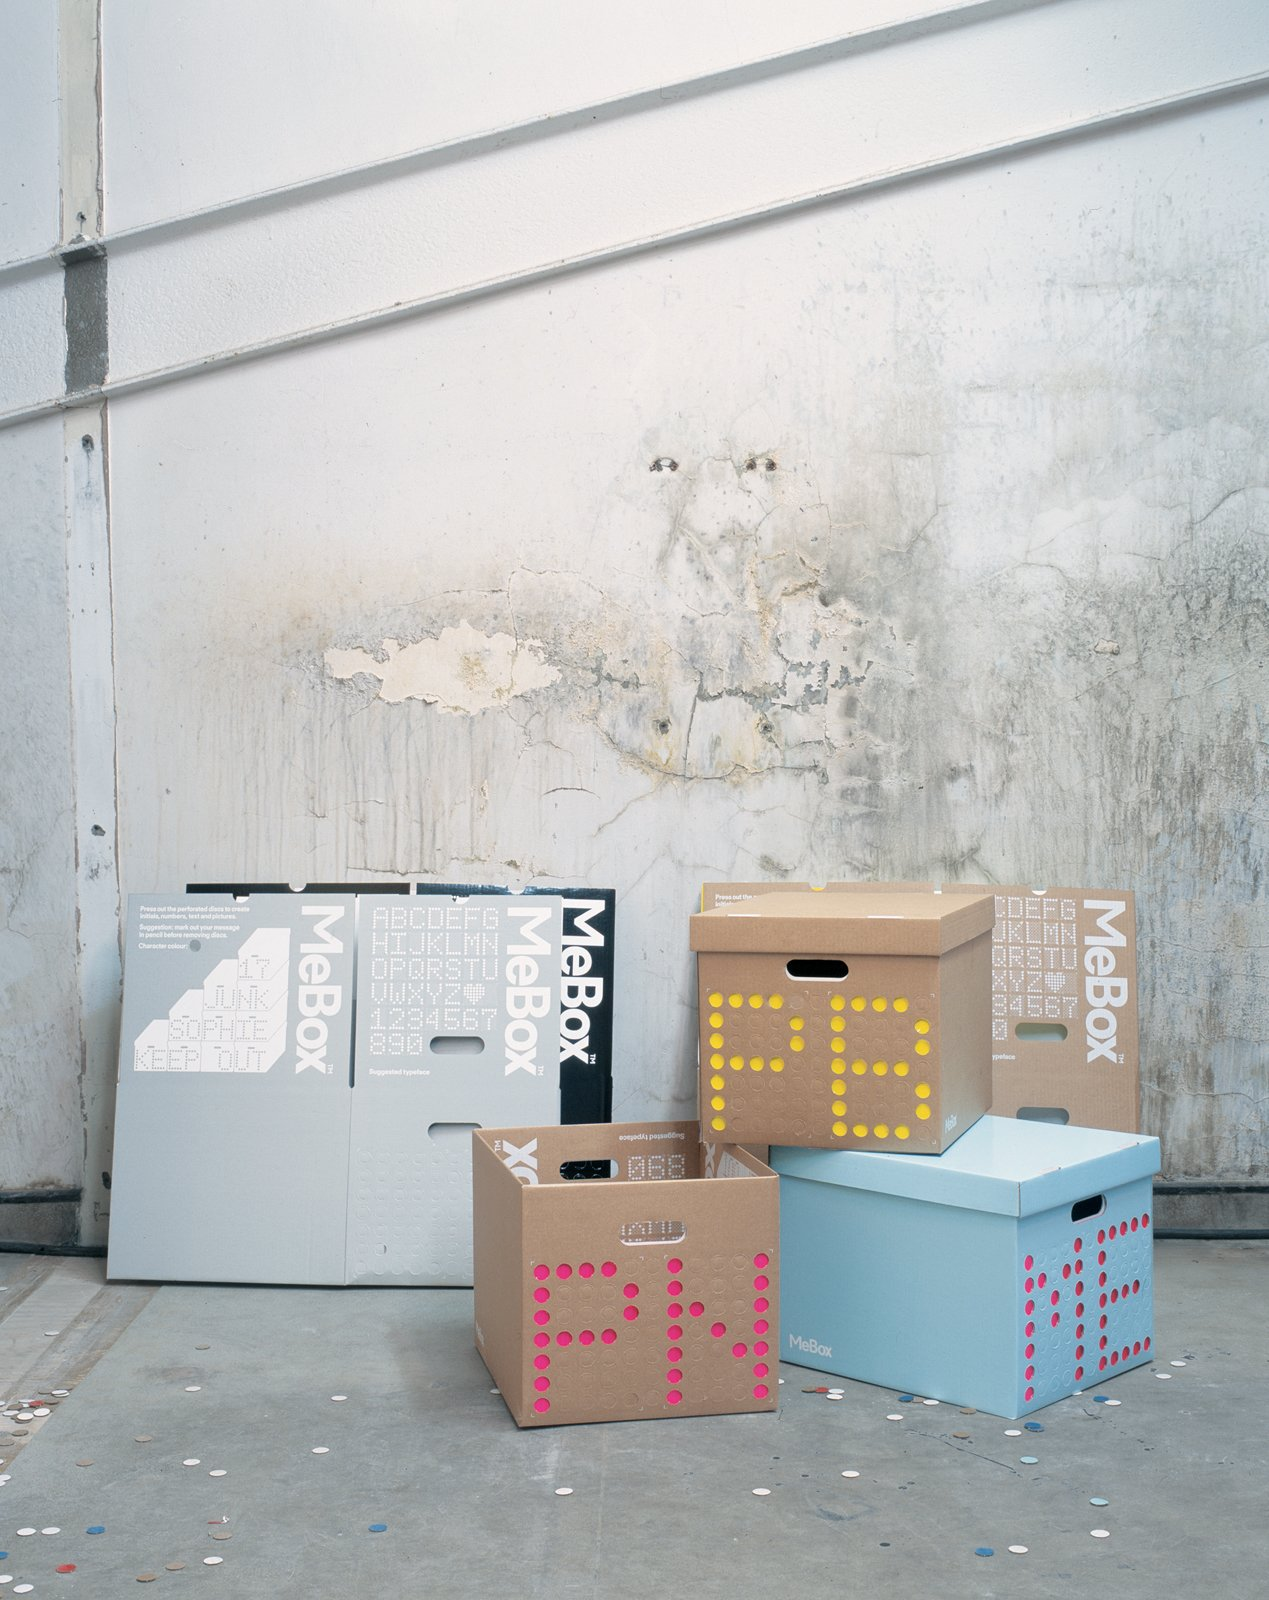 "MeBox by Graphic Thought Facility  Search ""전주오피《《www.MAT55.com》》⊀달밤⊁대비∥전주오피ಓ전주룸사롱ꌛ전주출장ꌙ전주Hugetelꏎ전주업소✘전주안마"" from Outside the Box: Cardboard Design"